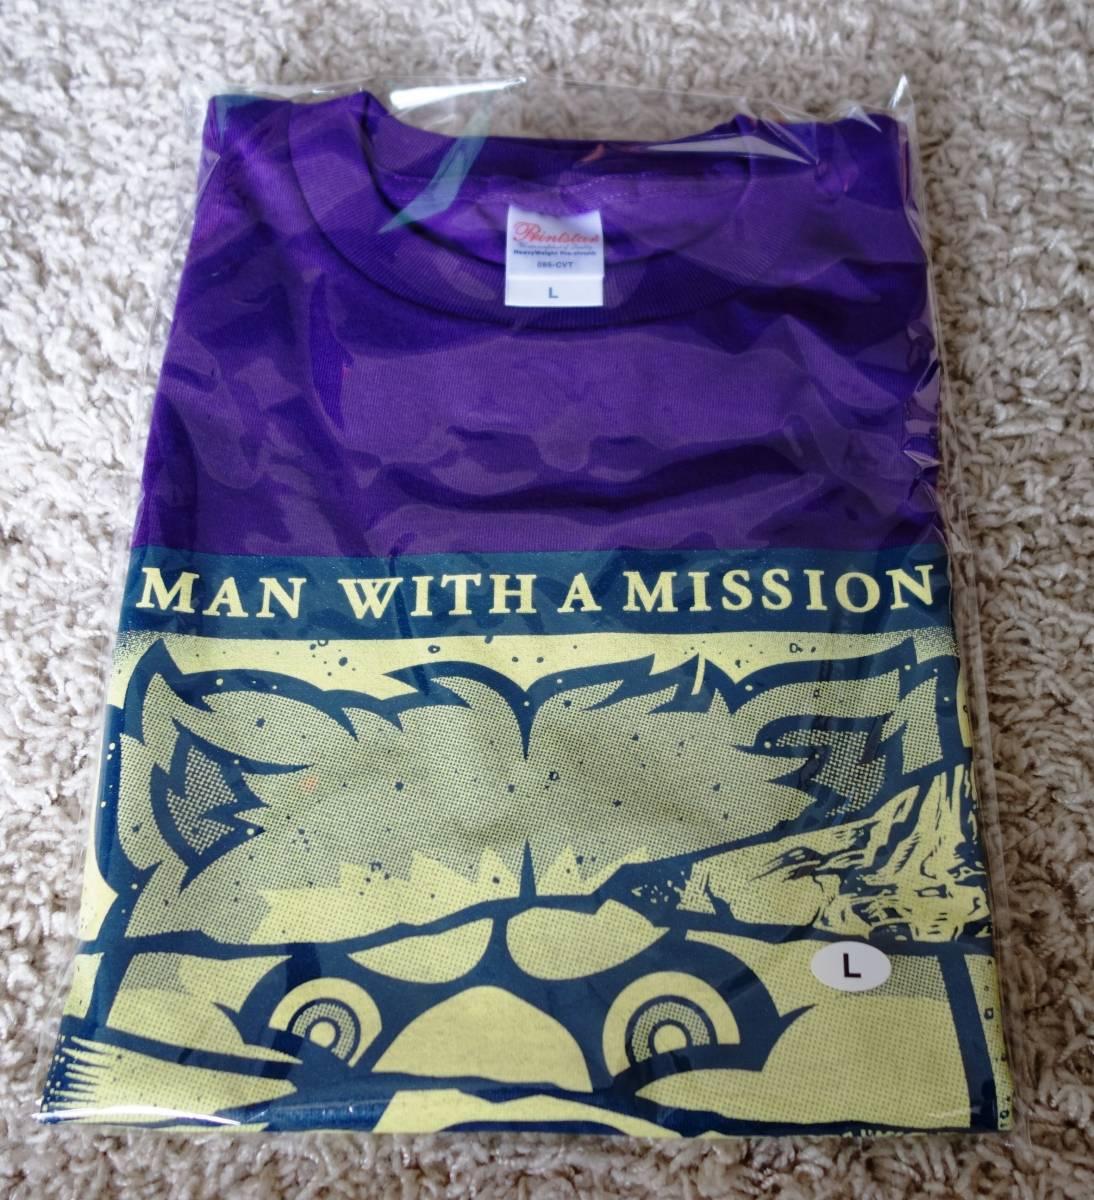 MAN WITH A MISSION マンウィズ W.O.Fツアー Tシャツ LINE ver パープル 紫 通販先行カラー Lサイズ The World's On Fire TOUR 2016 送料込